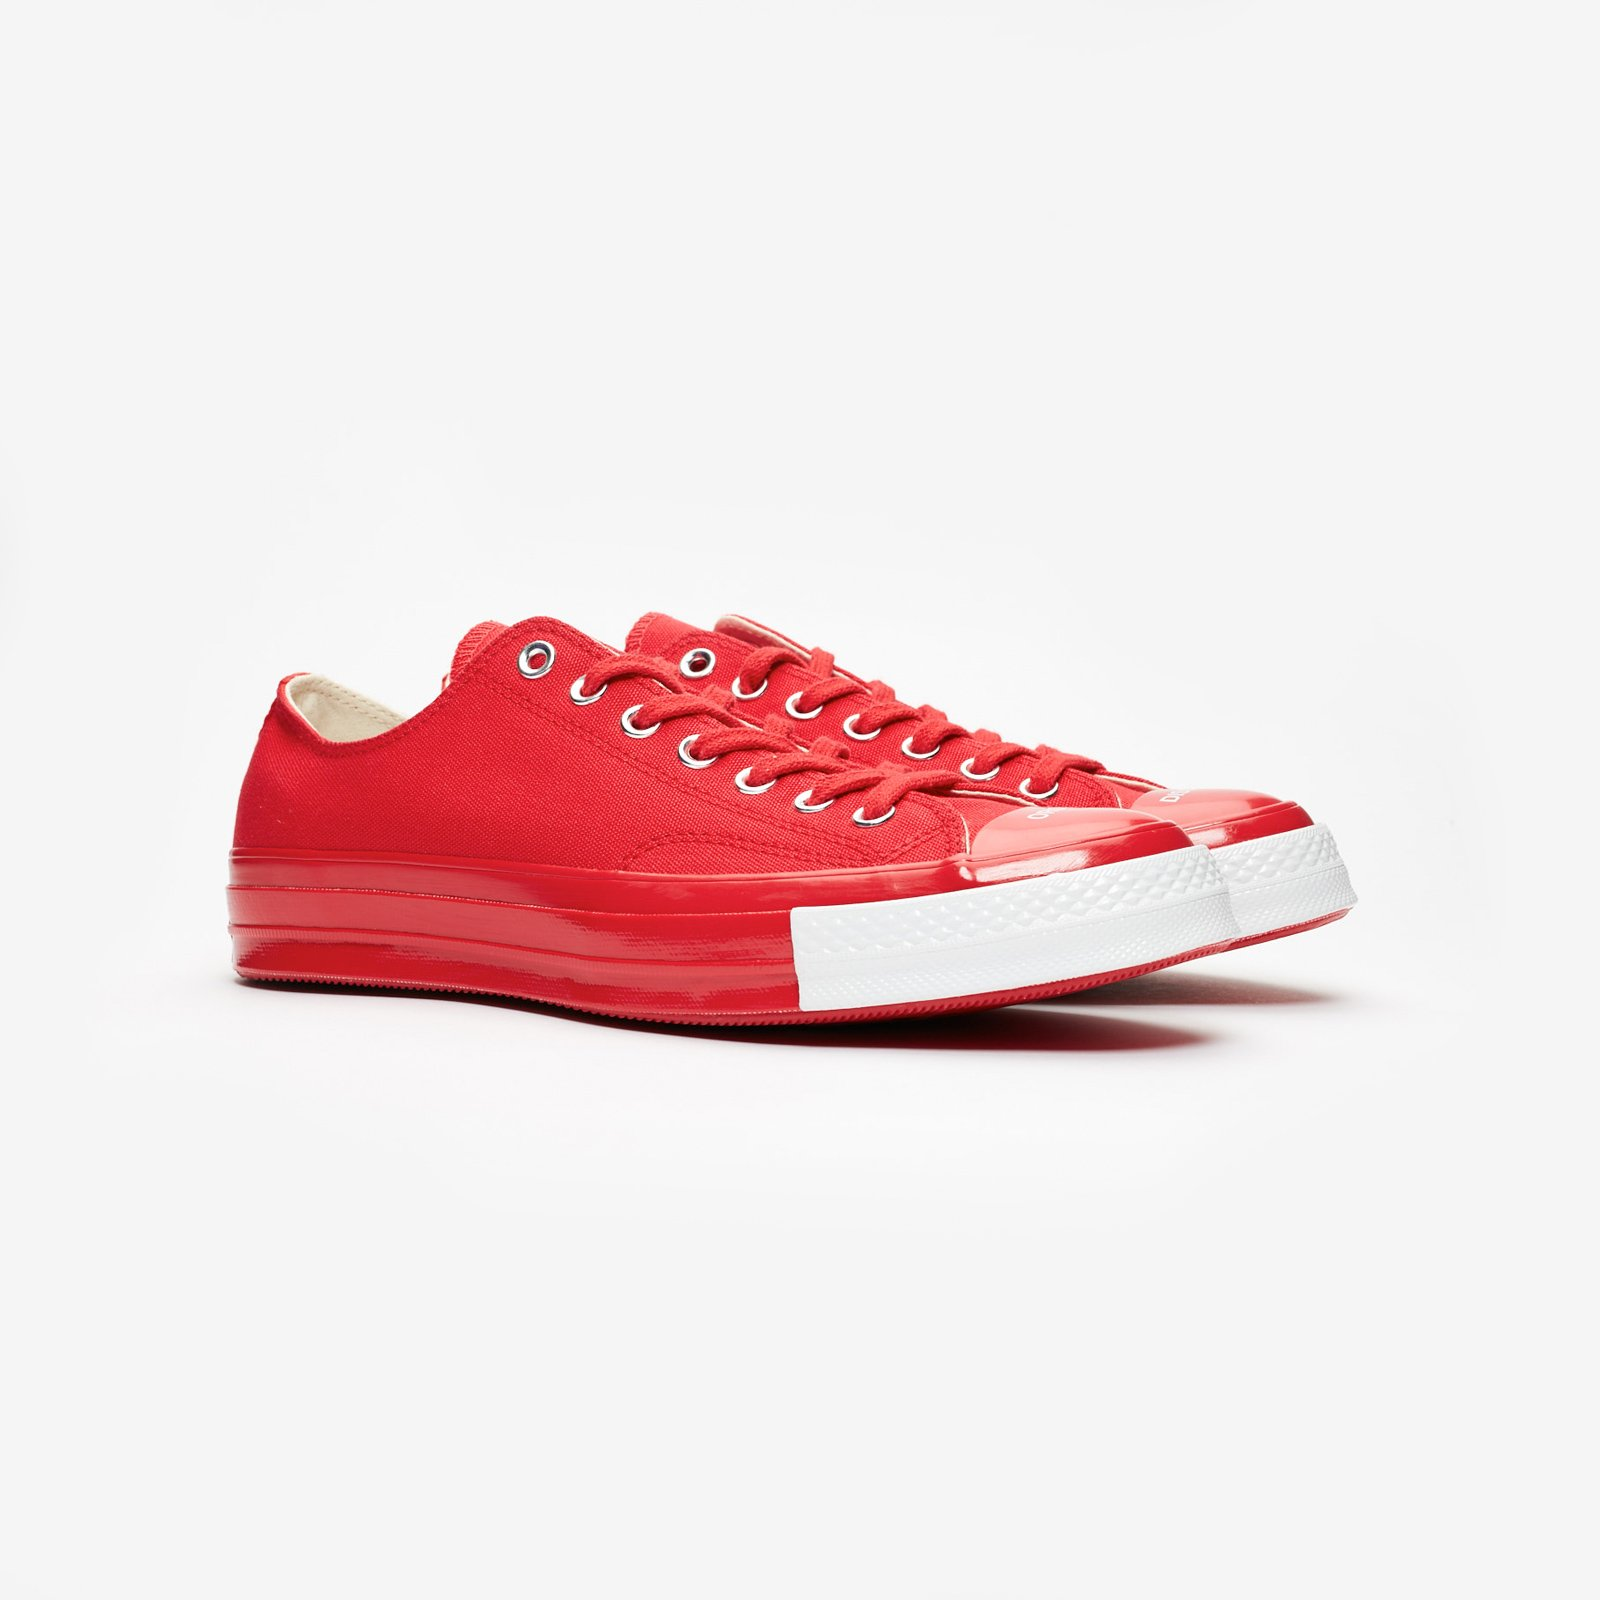 Converse Chuck 70 OX x Undercover 163012c Sneakersnstuff